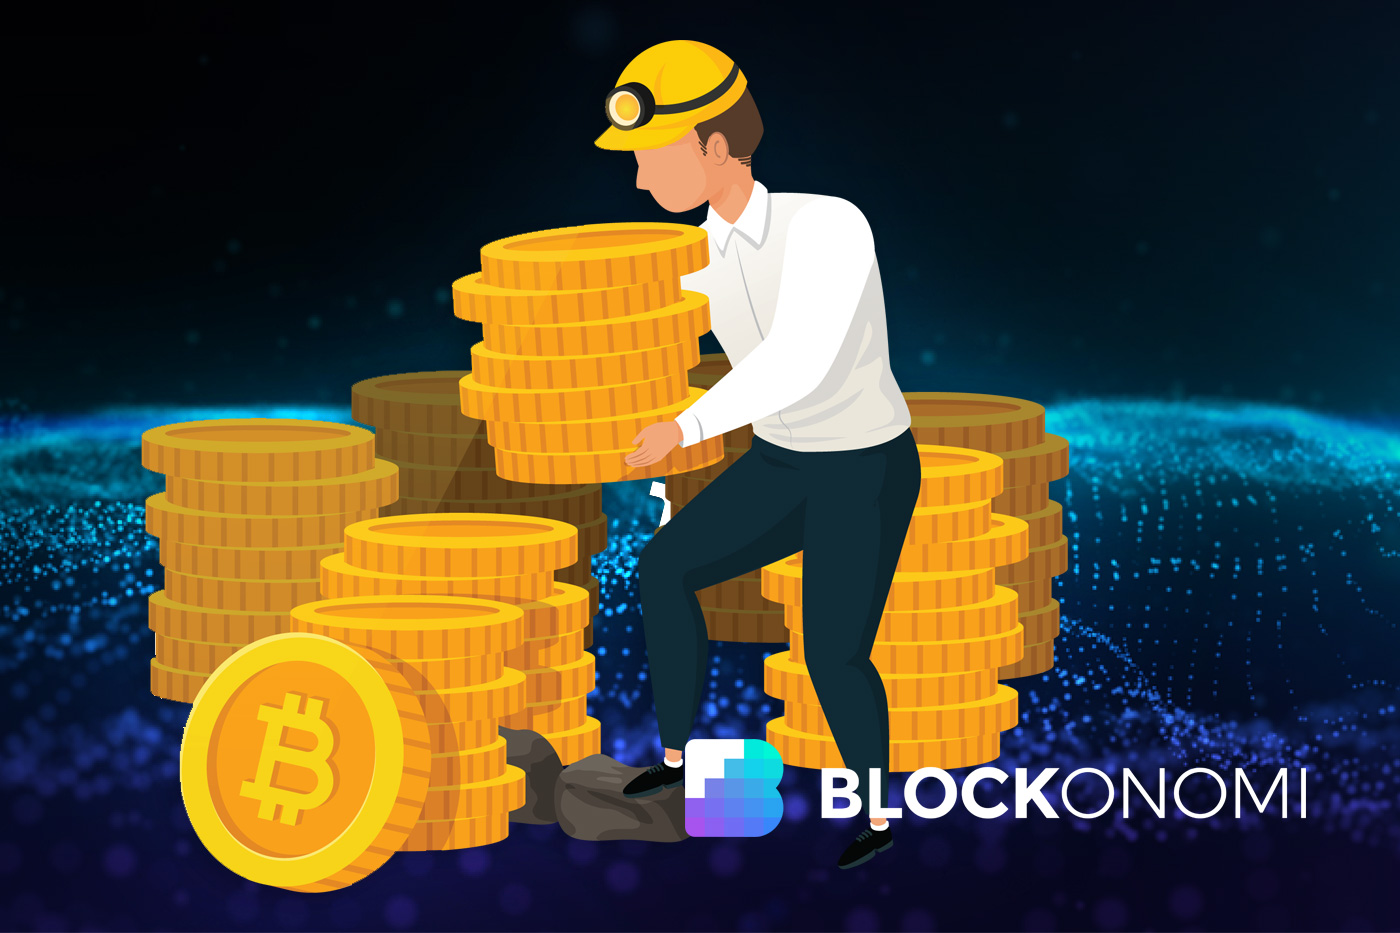 Bitcoin Proof of Work Mining